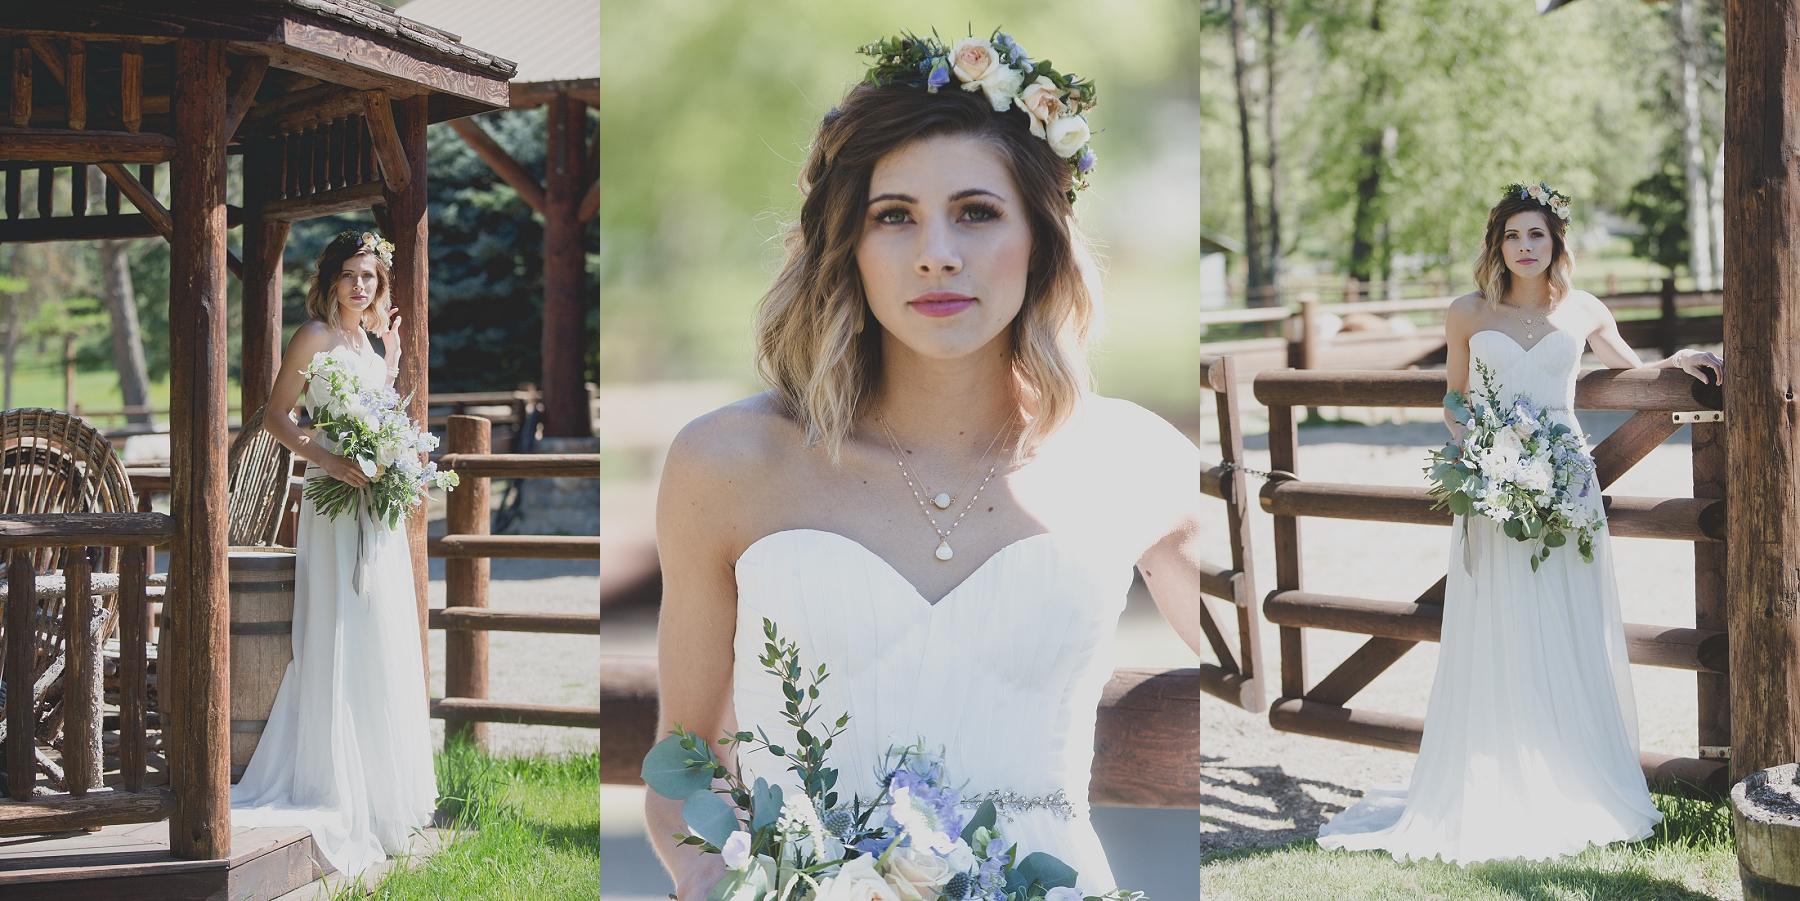 Jennifer_Mooney_Photo_Flathead_Lake_Lodge_Styled_Shoot_00047 - Copy.jpg